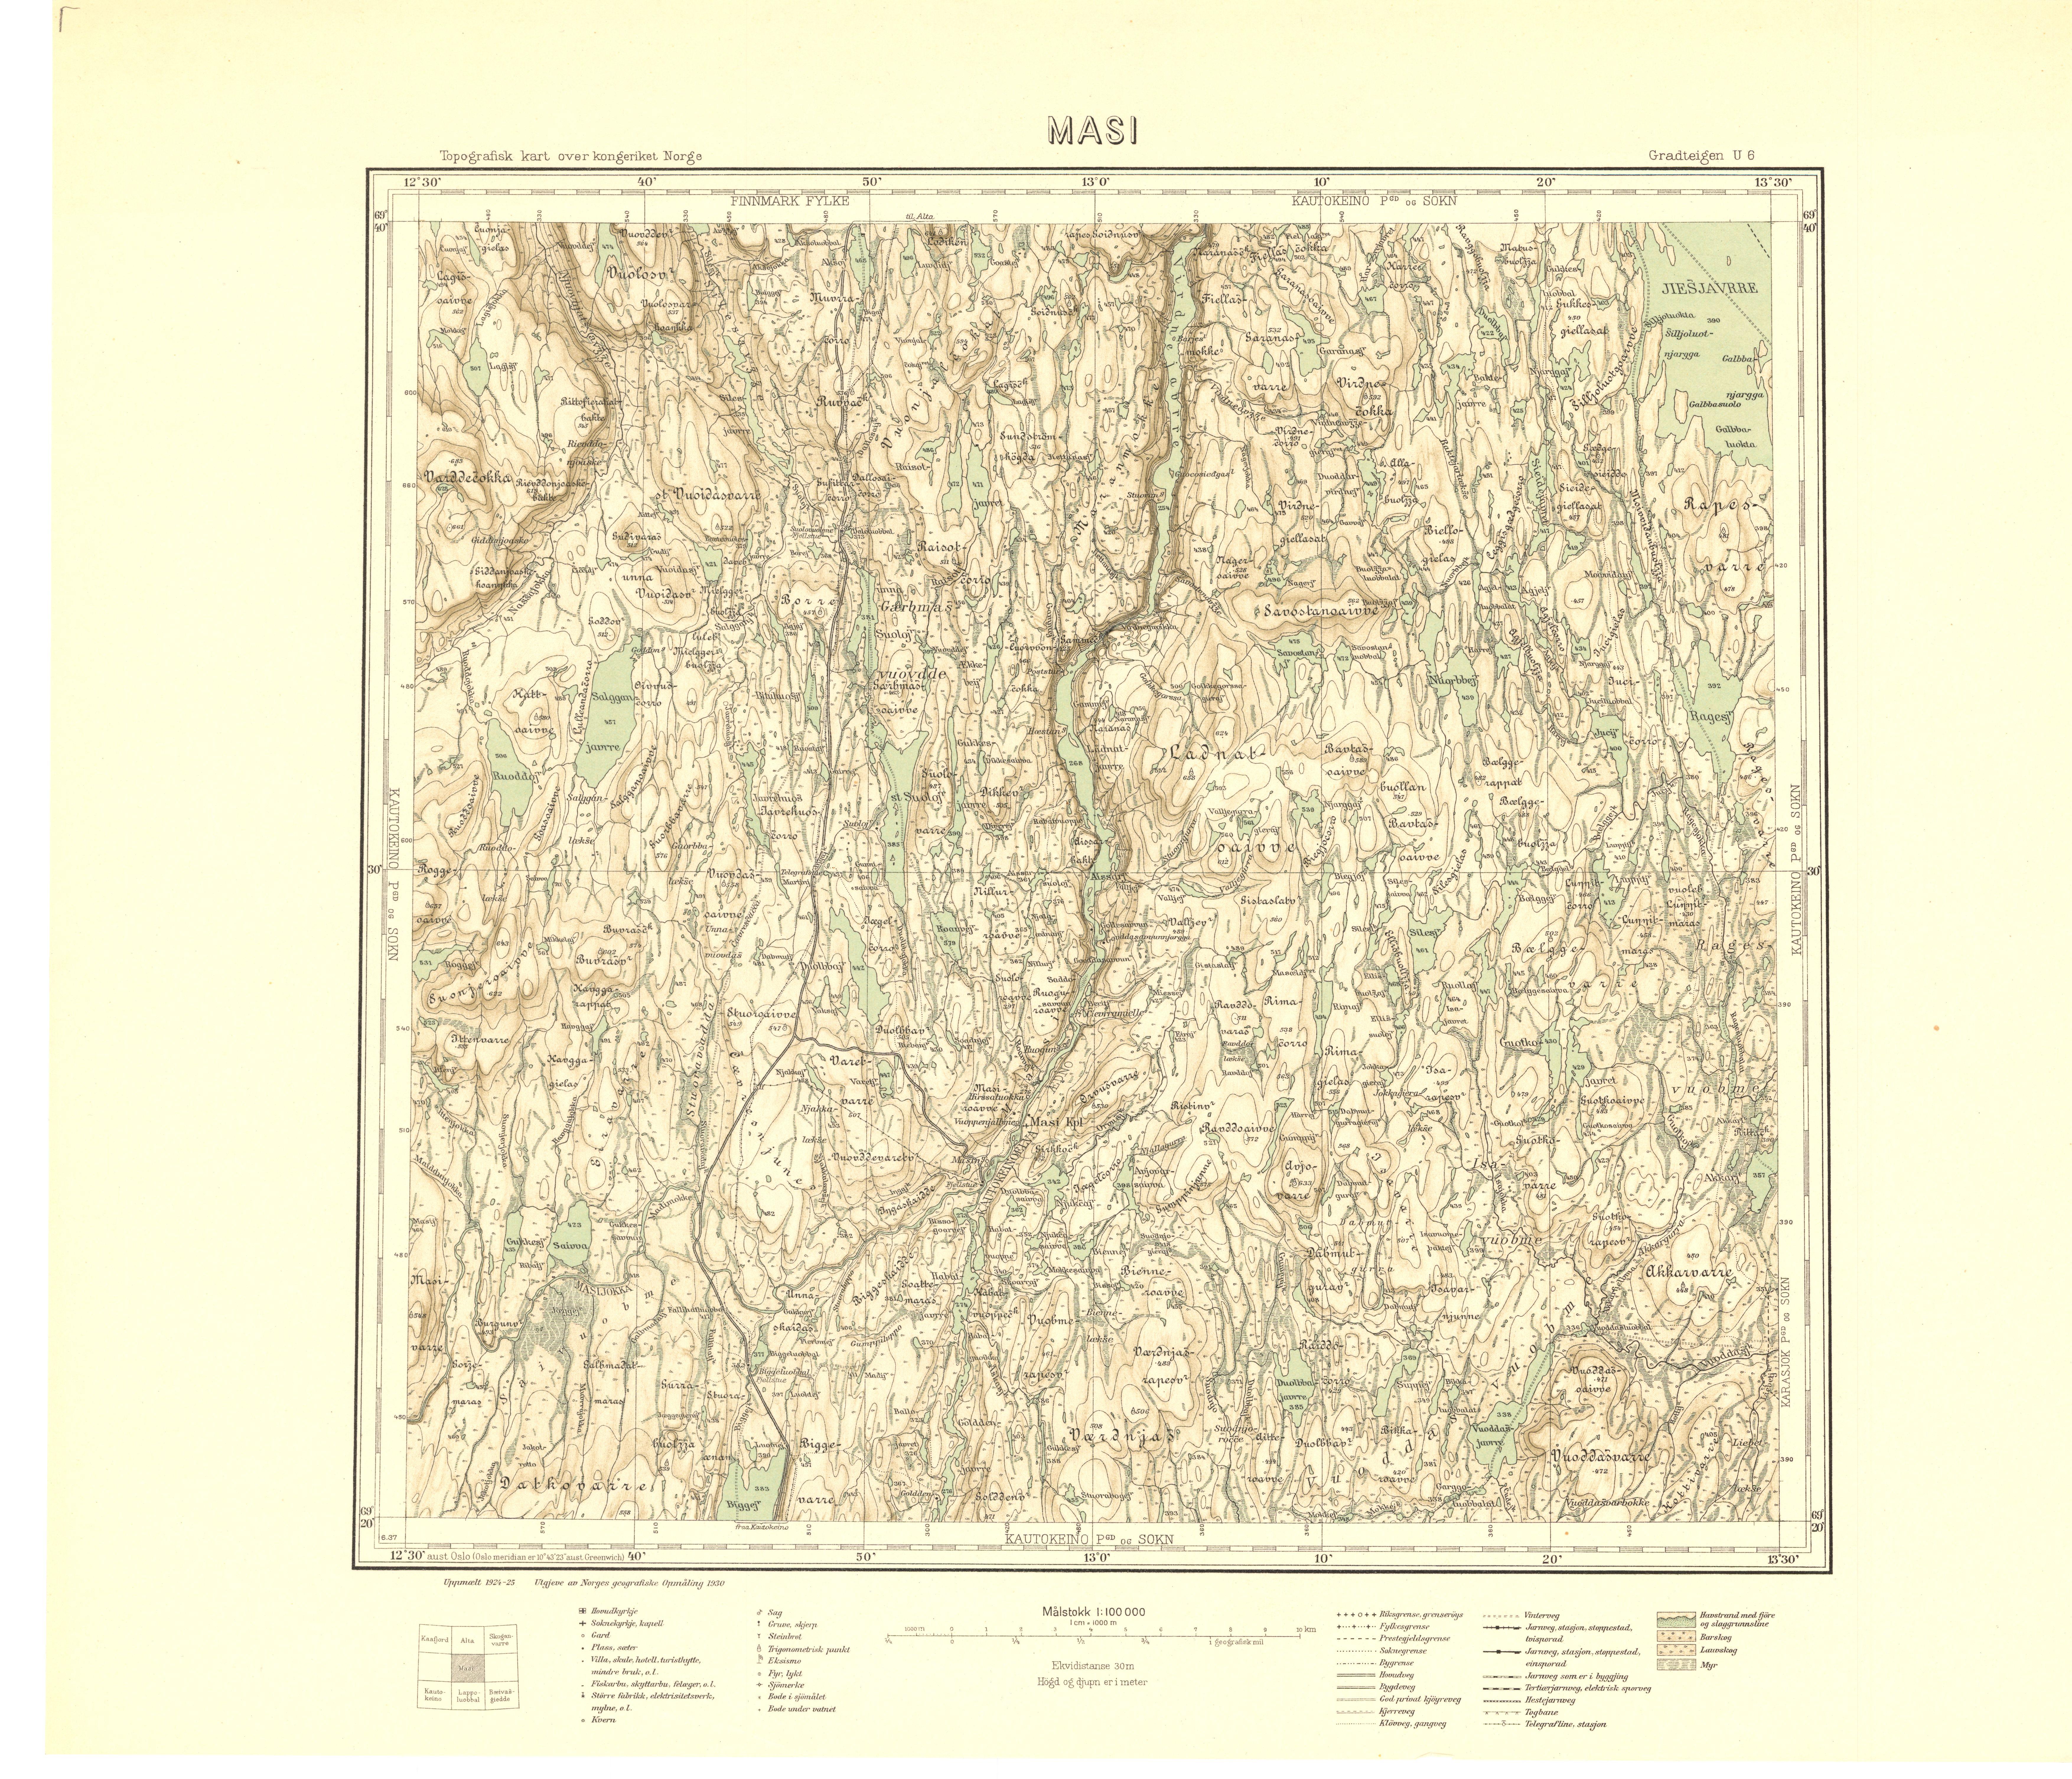 File Topographic Map Of Norway U6 Masi 1930 Jpg Wikimedia Commons